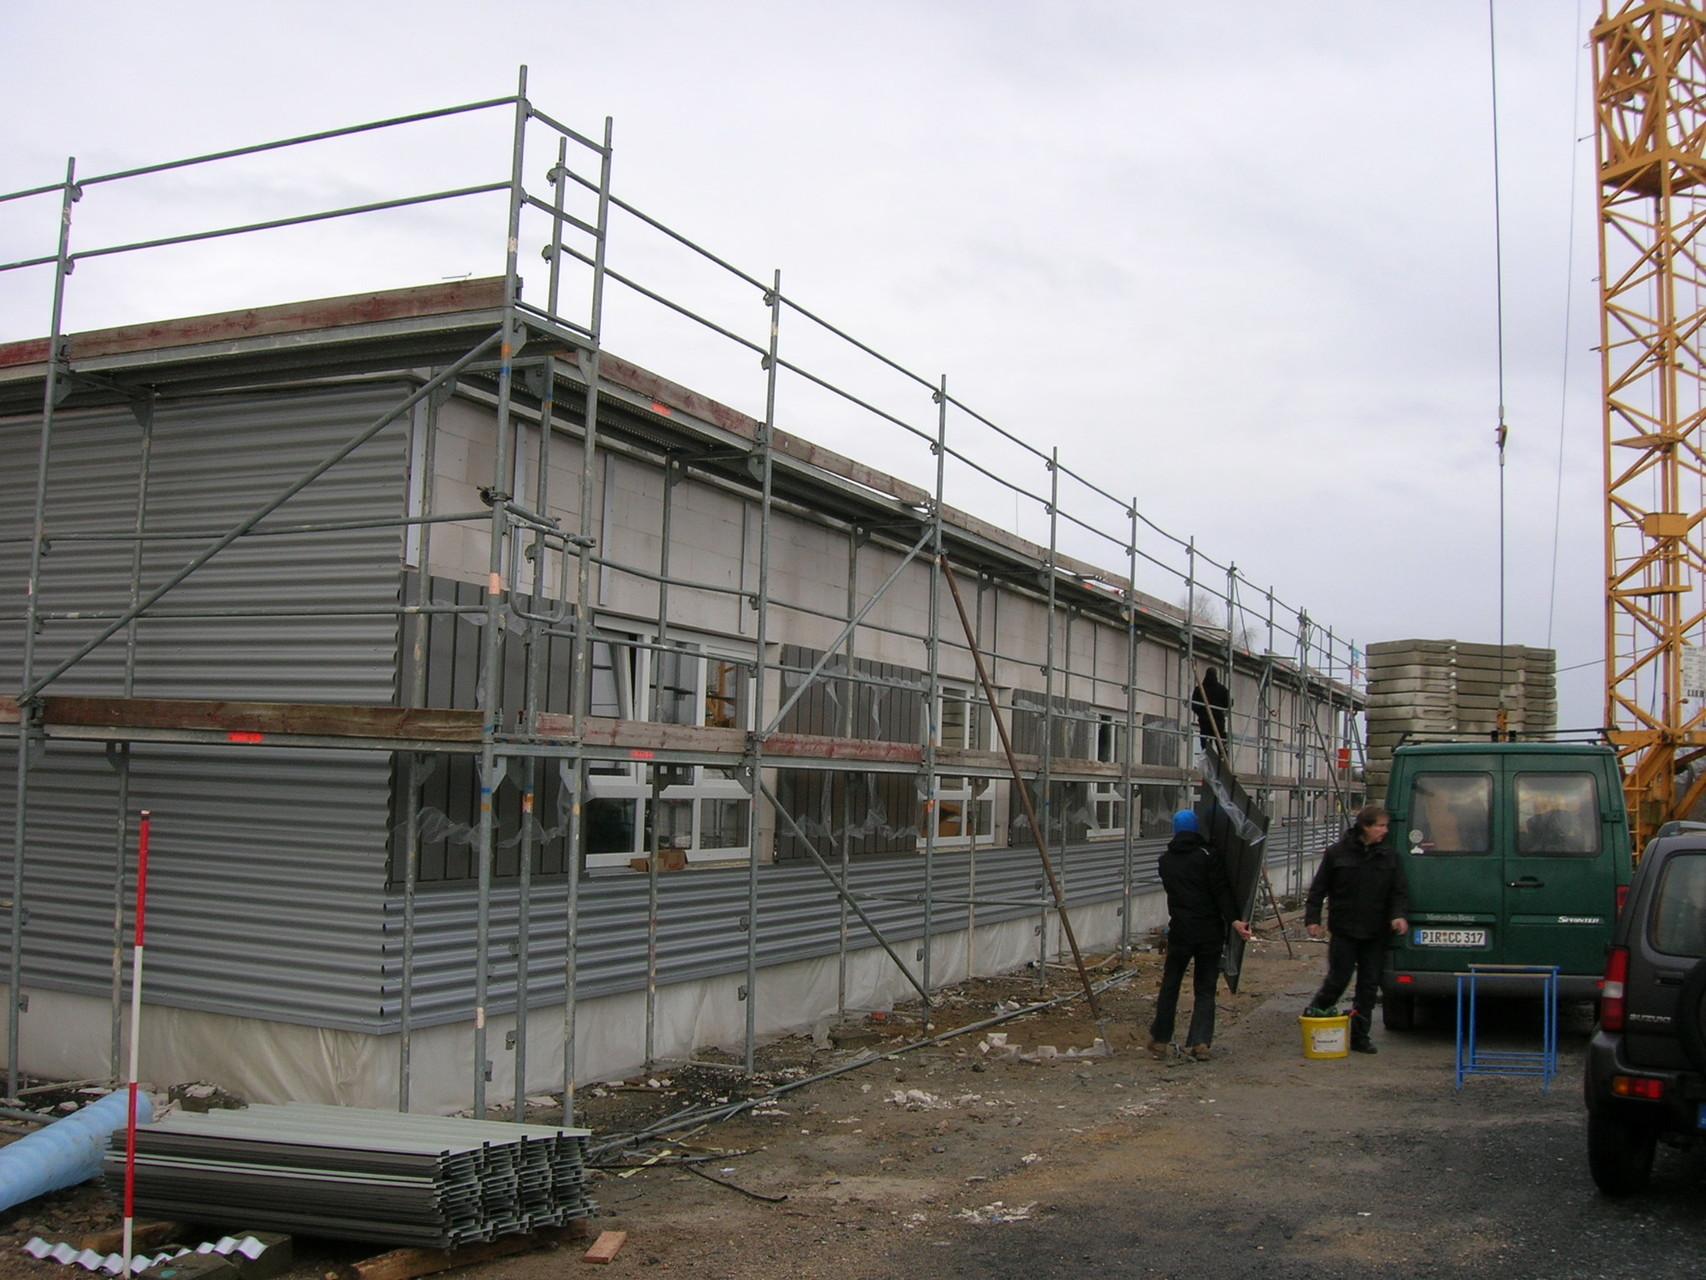 Neubau Fertigungshalle, Kamenz, 2013